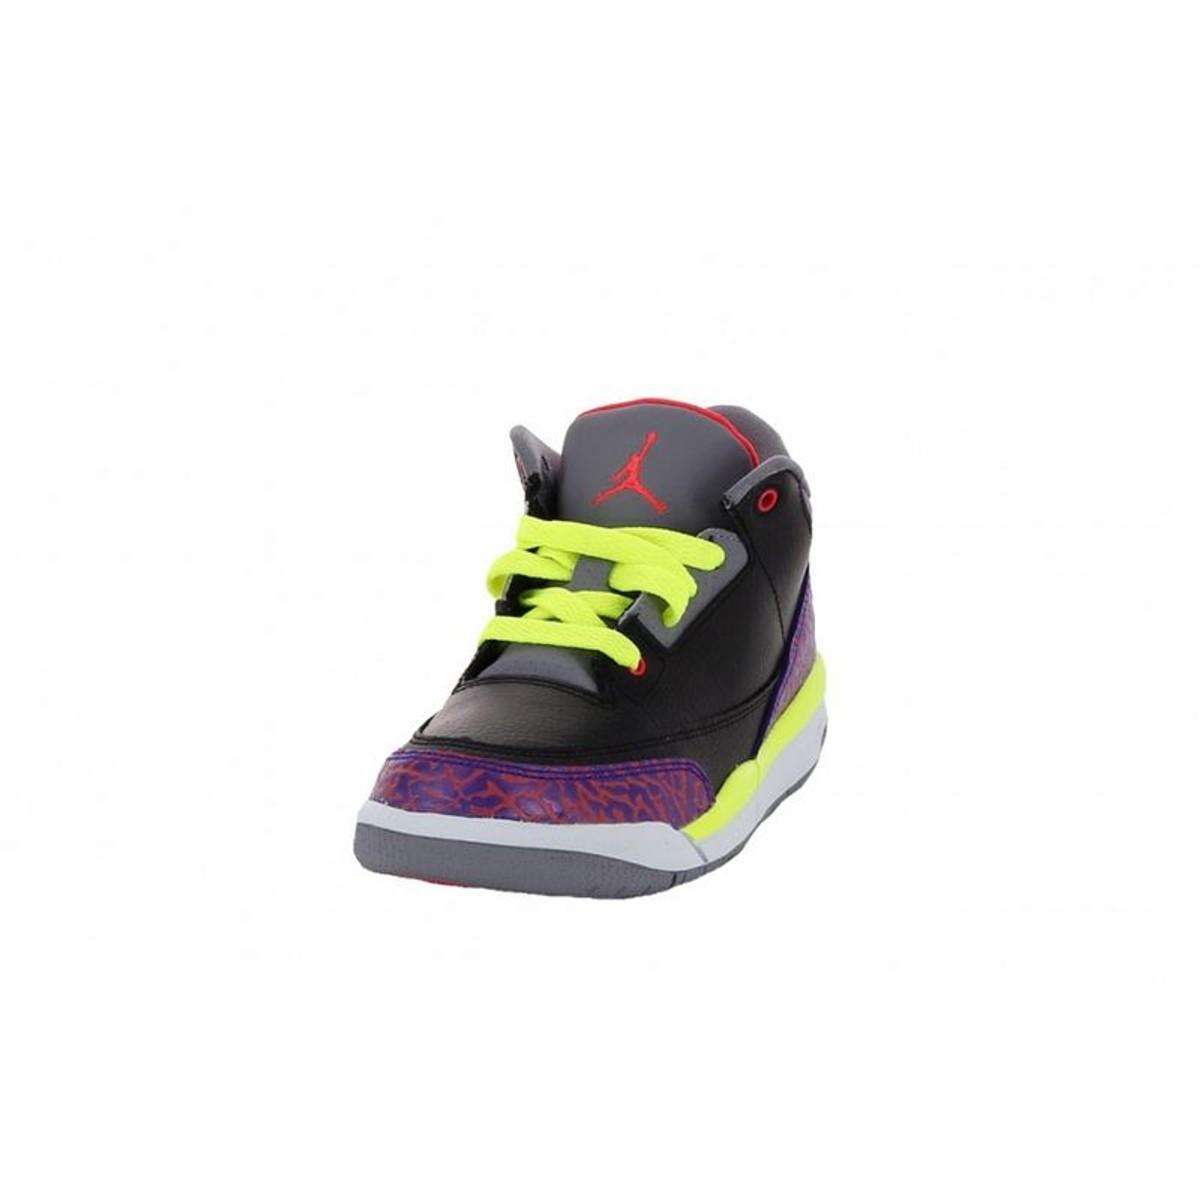 la meilleure attitude 6b7ab dfac1 Basket Nike Air Jordan 3 Retro Cadet (ps) - 441141-039 ...